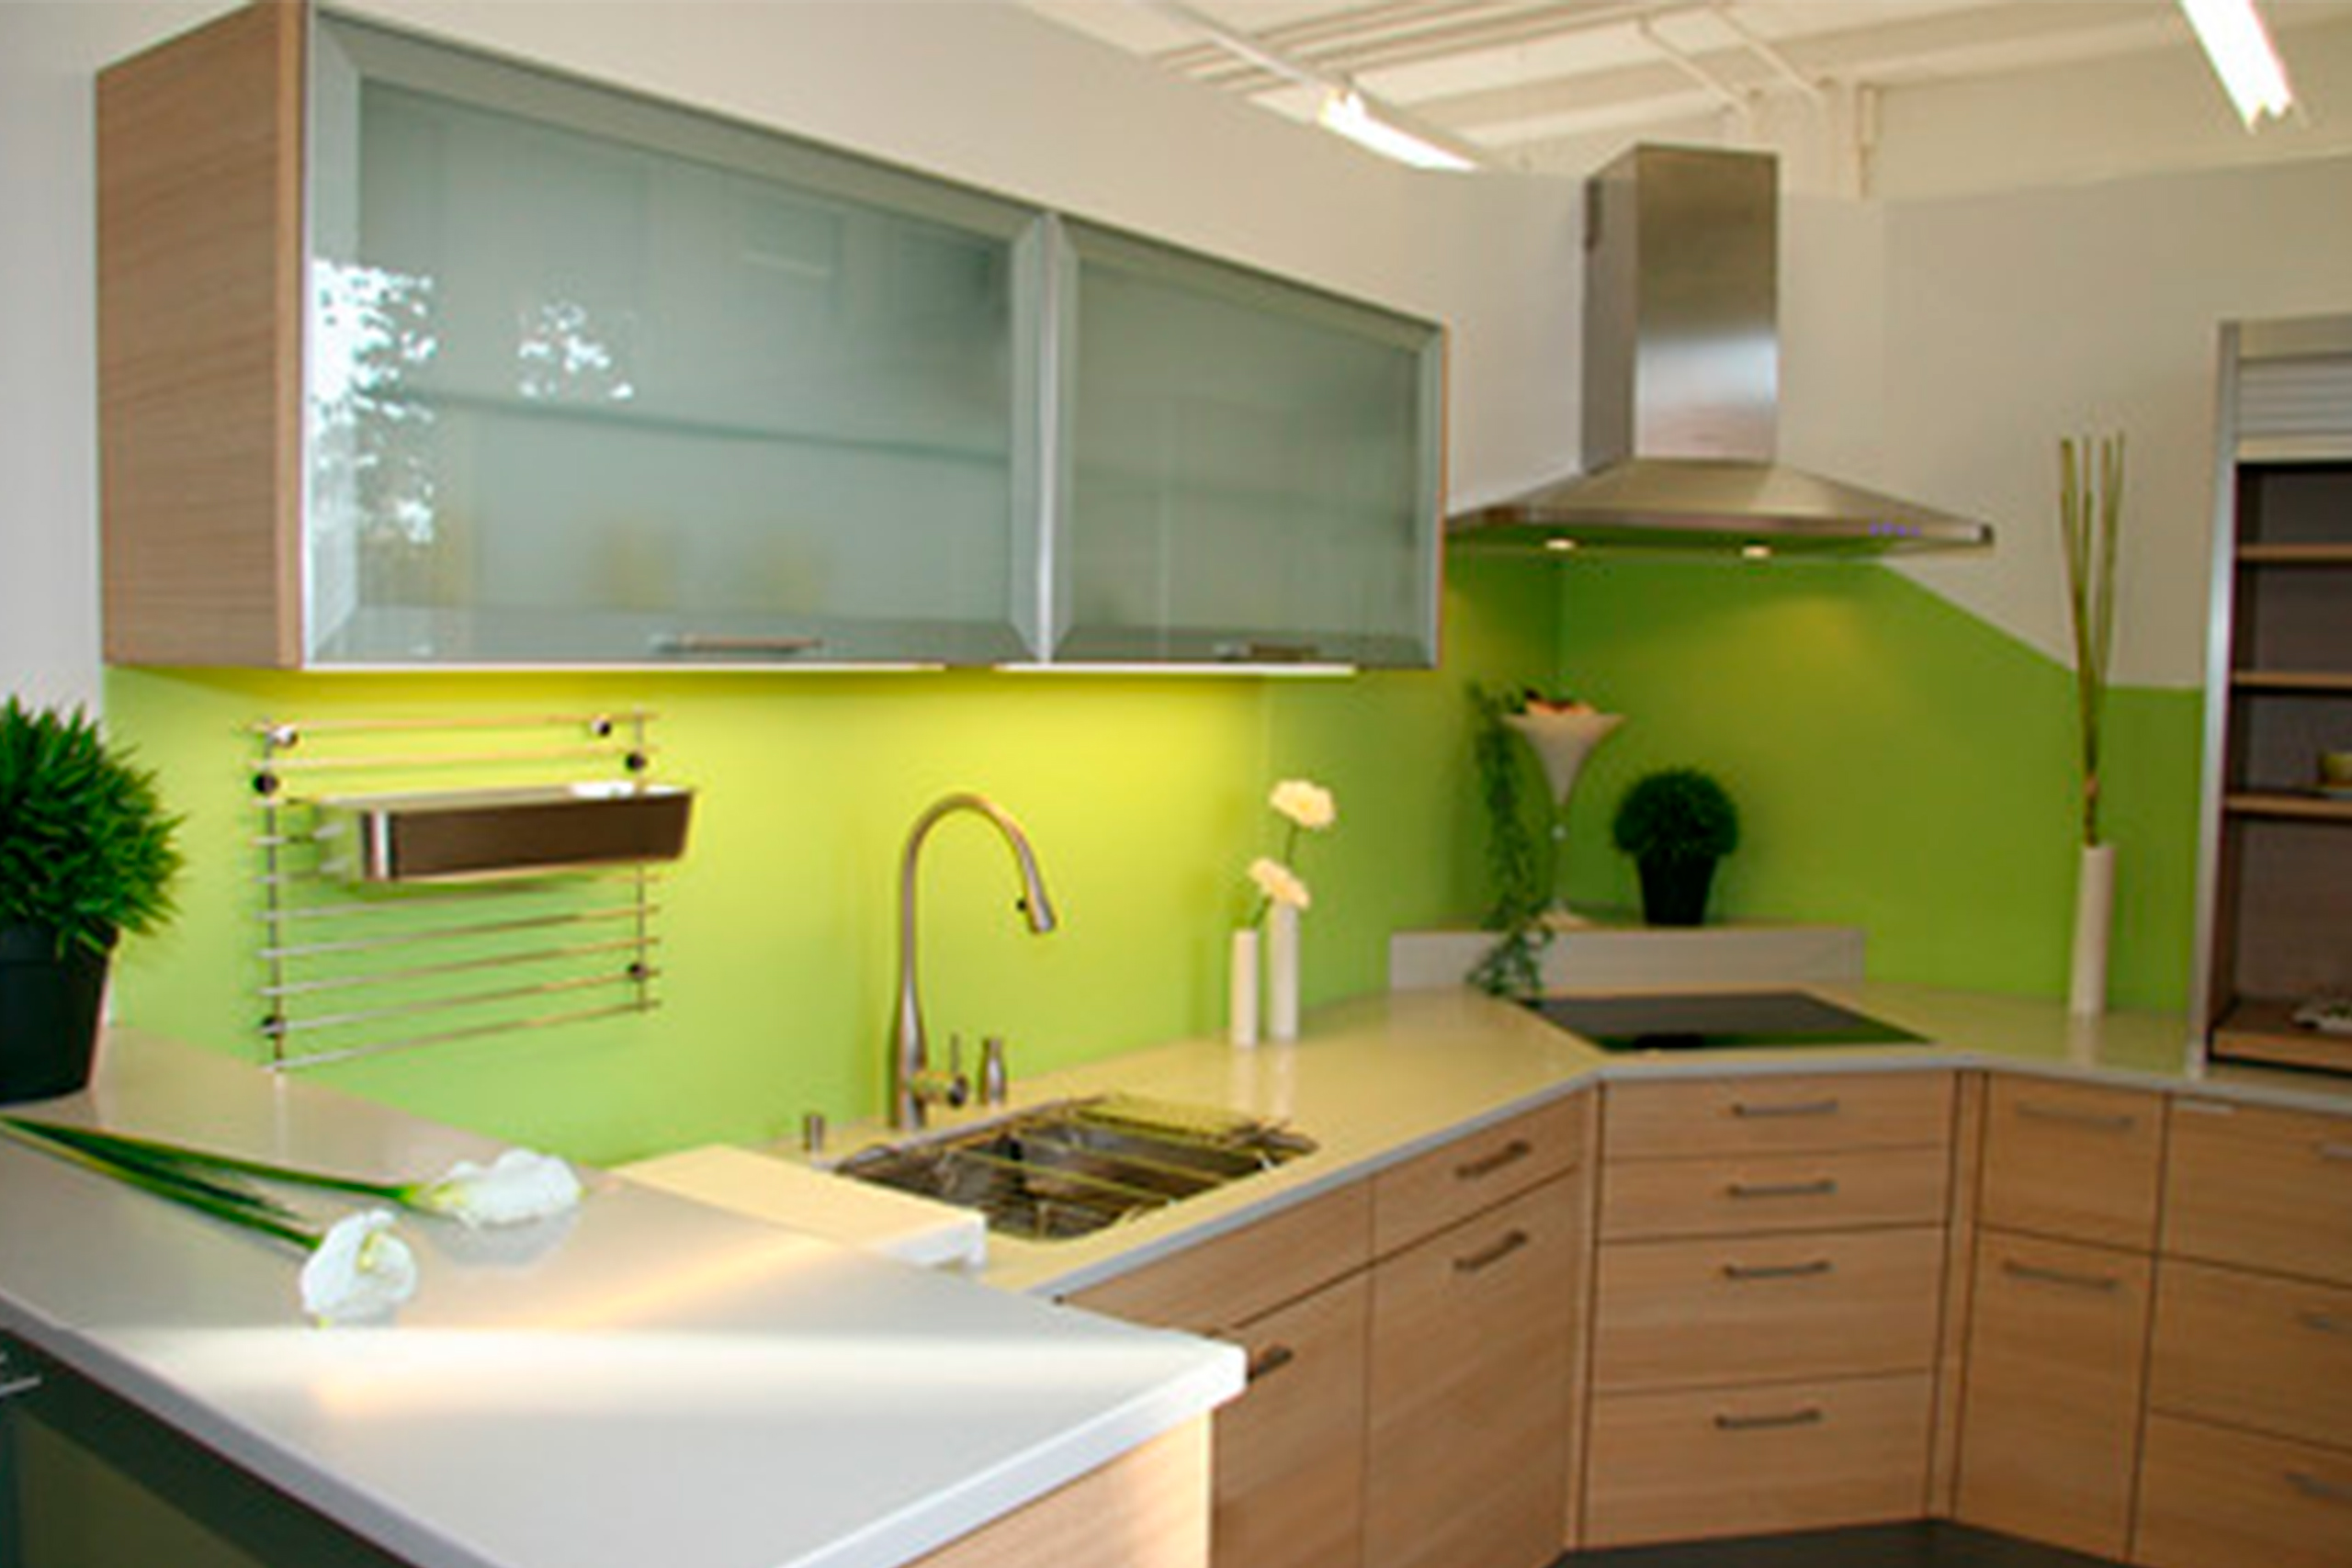 Küchenrückwand aus Glas grün